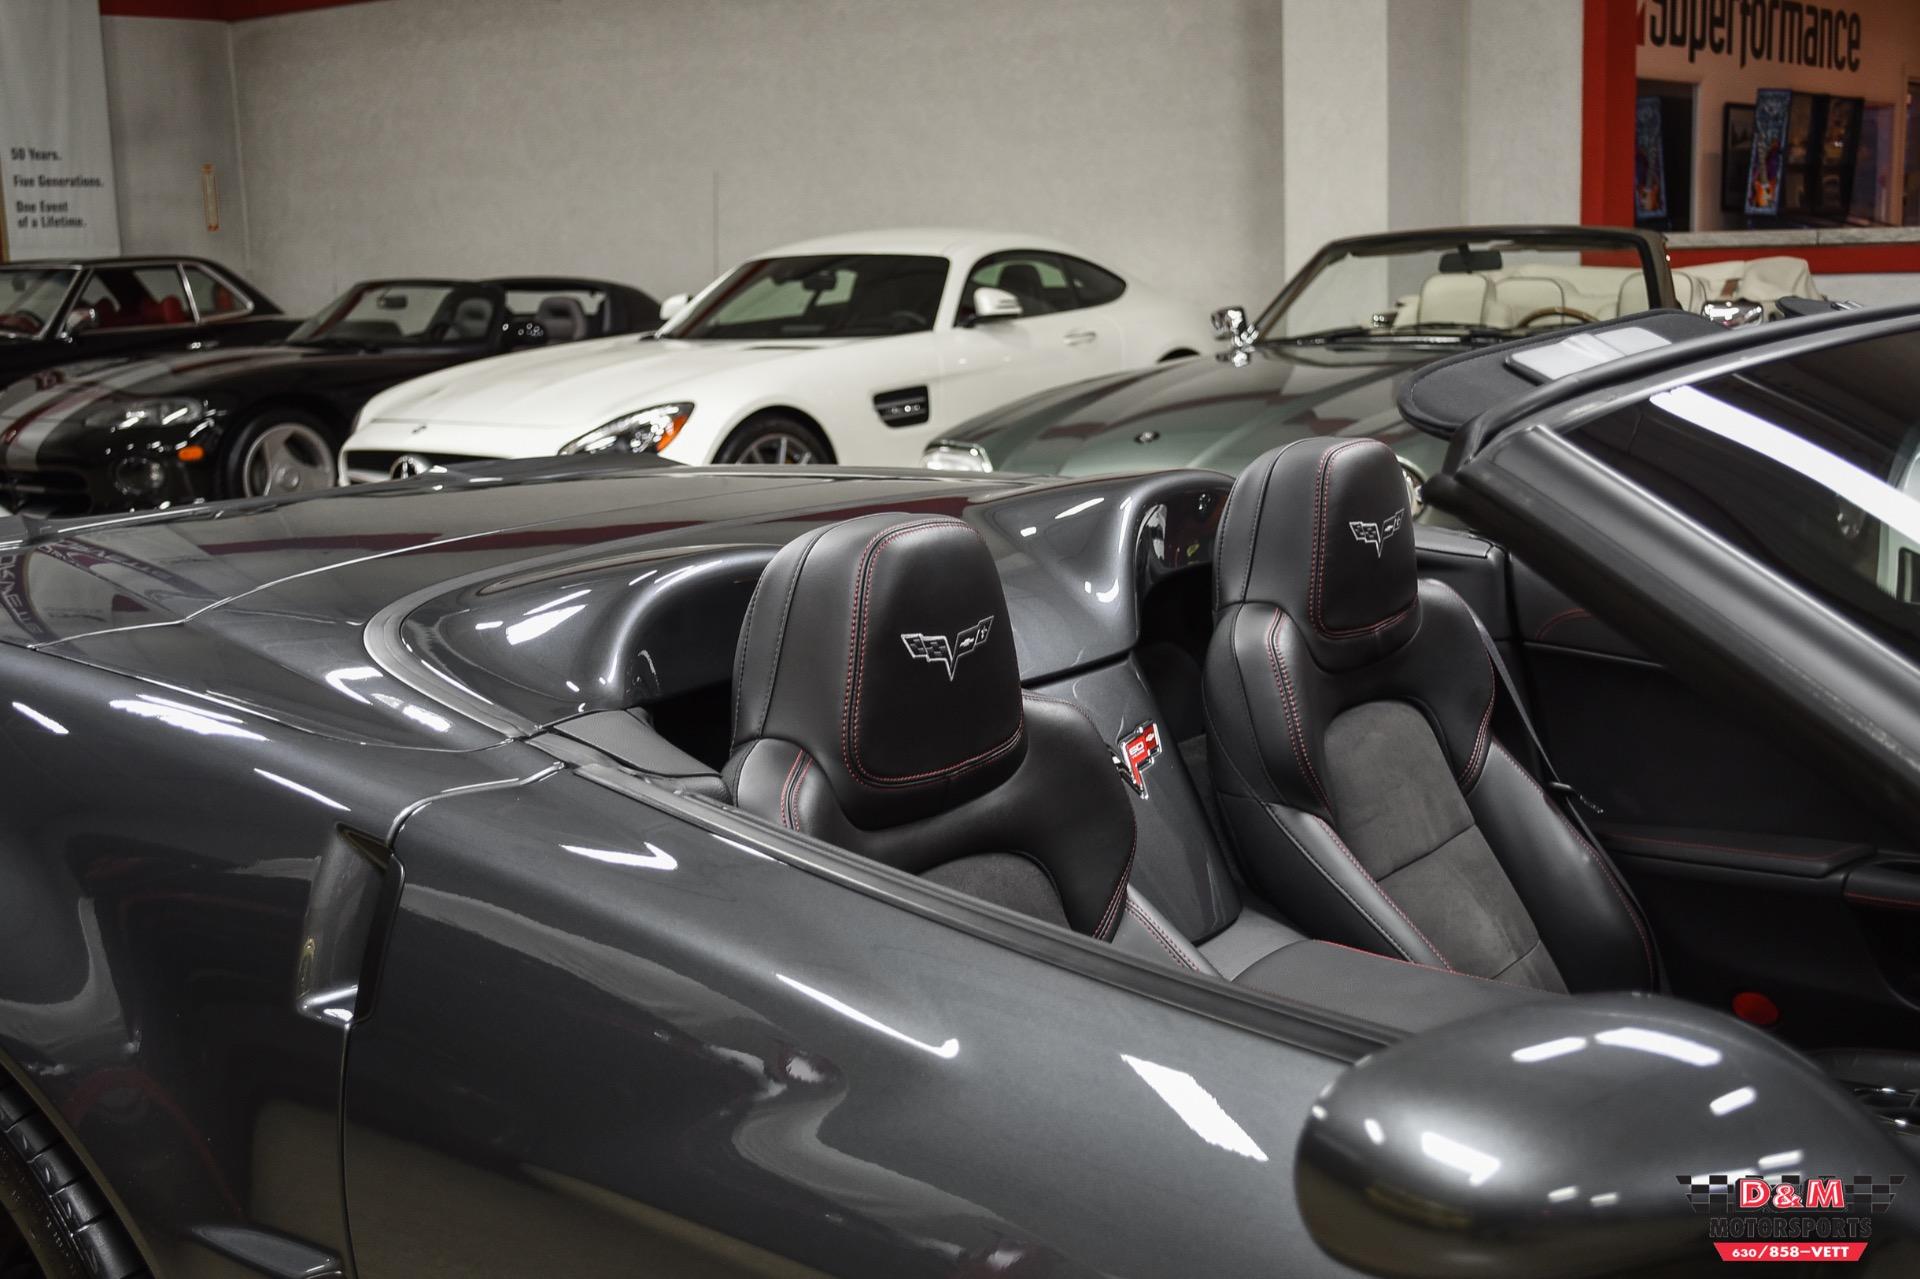 Used 2013 Chevrolet Corvette 427 Convertible | Glen Ellyn, IL